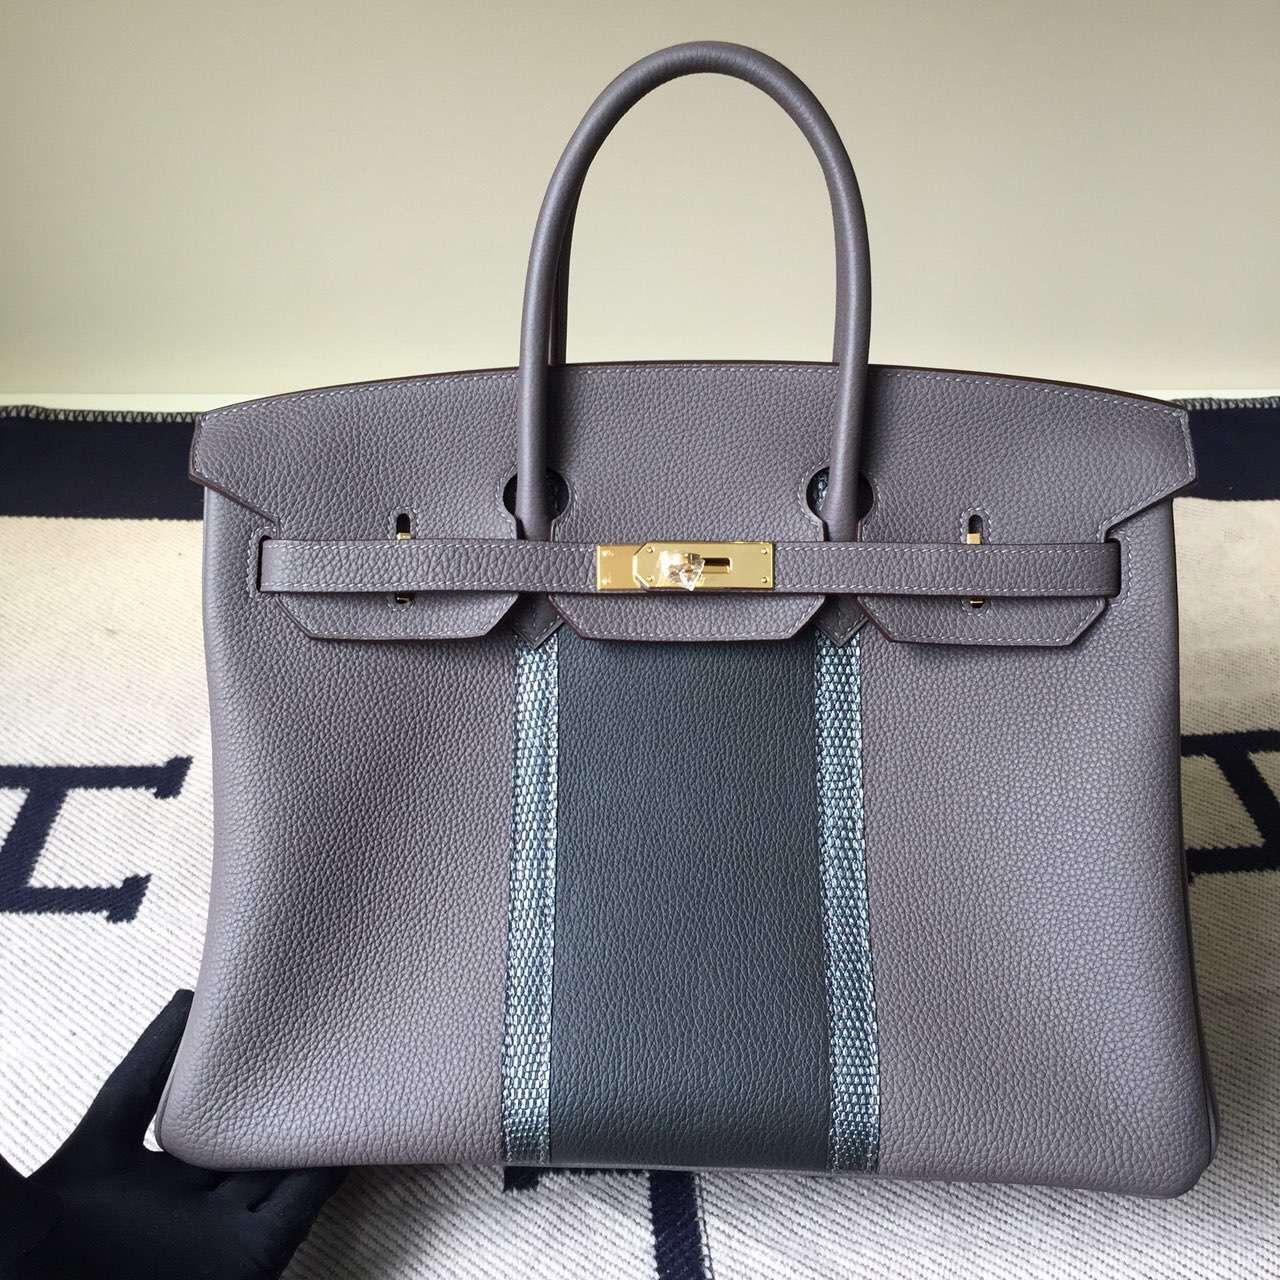 Luxury Hermes Birkin Bag 35cm Grey Togo Leather&Lizard Leather